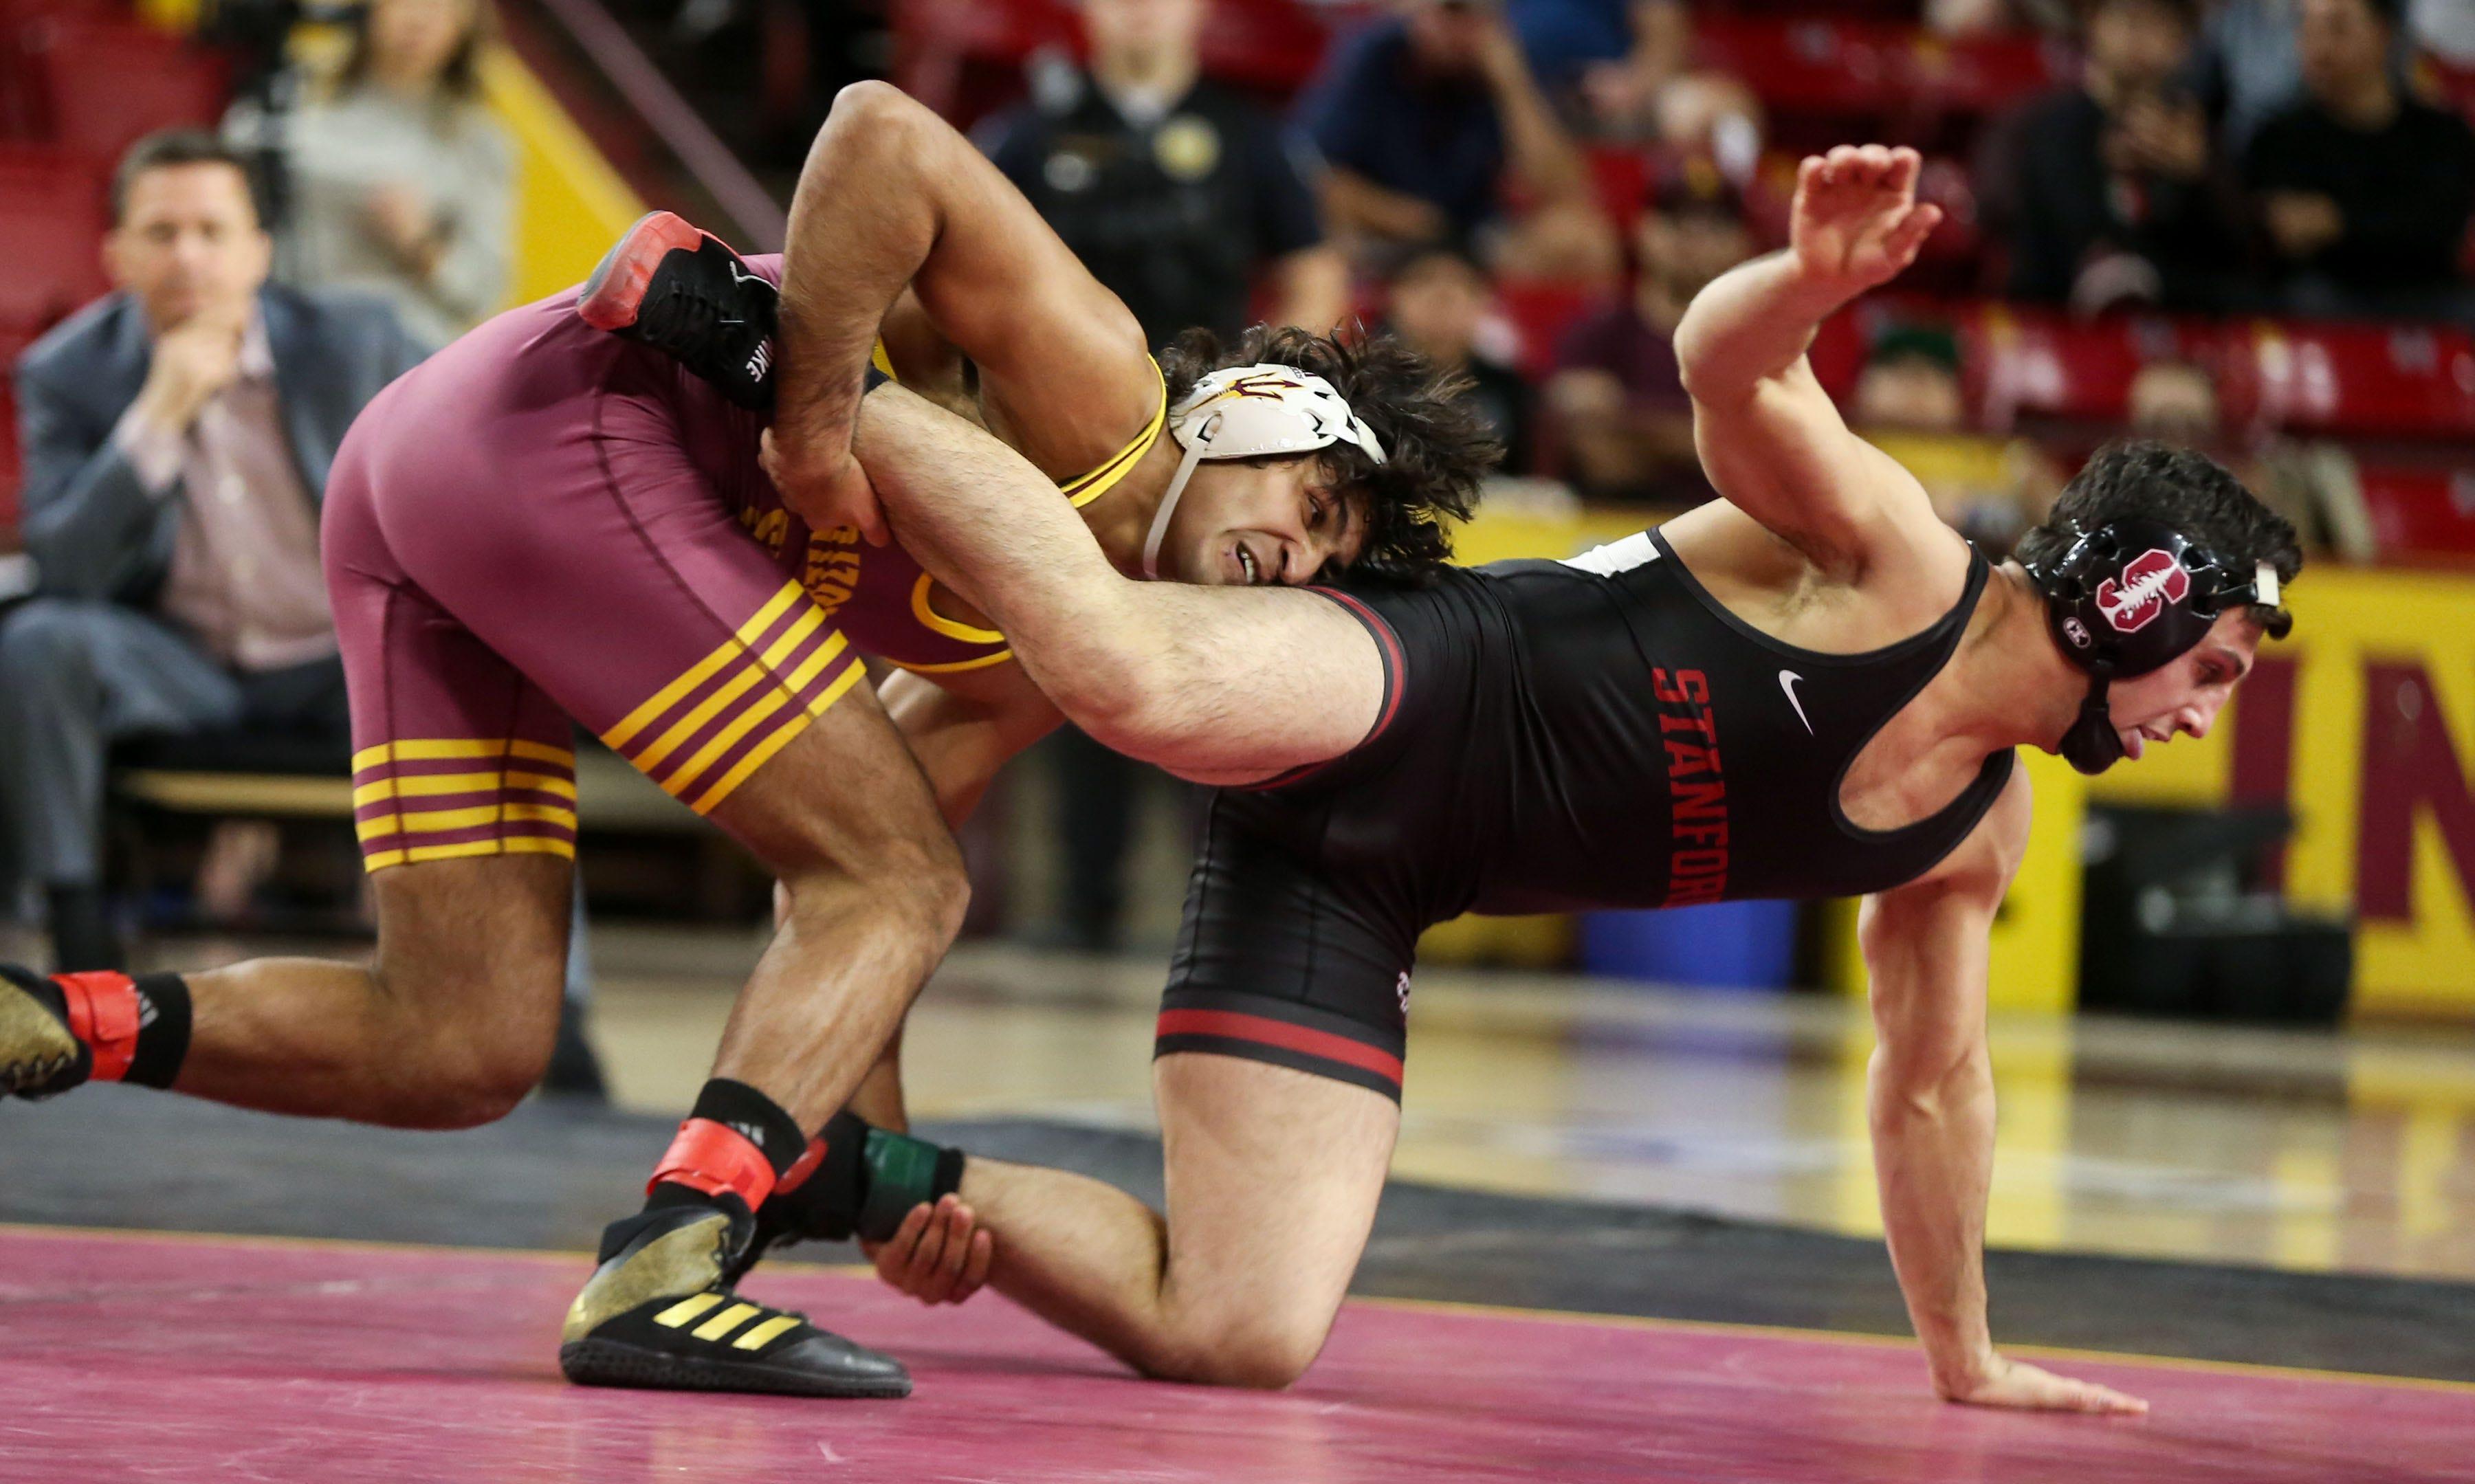 U S Olympic Wrestling Trials Postponed Impacting Local Wrestlers